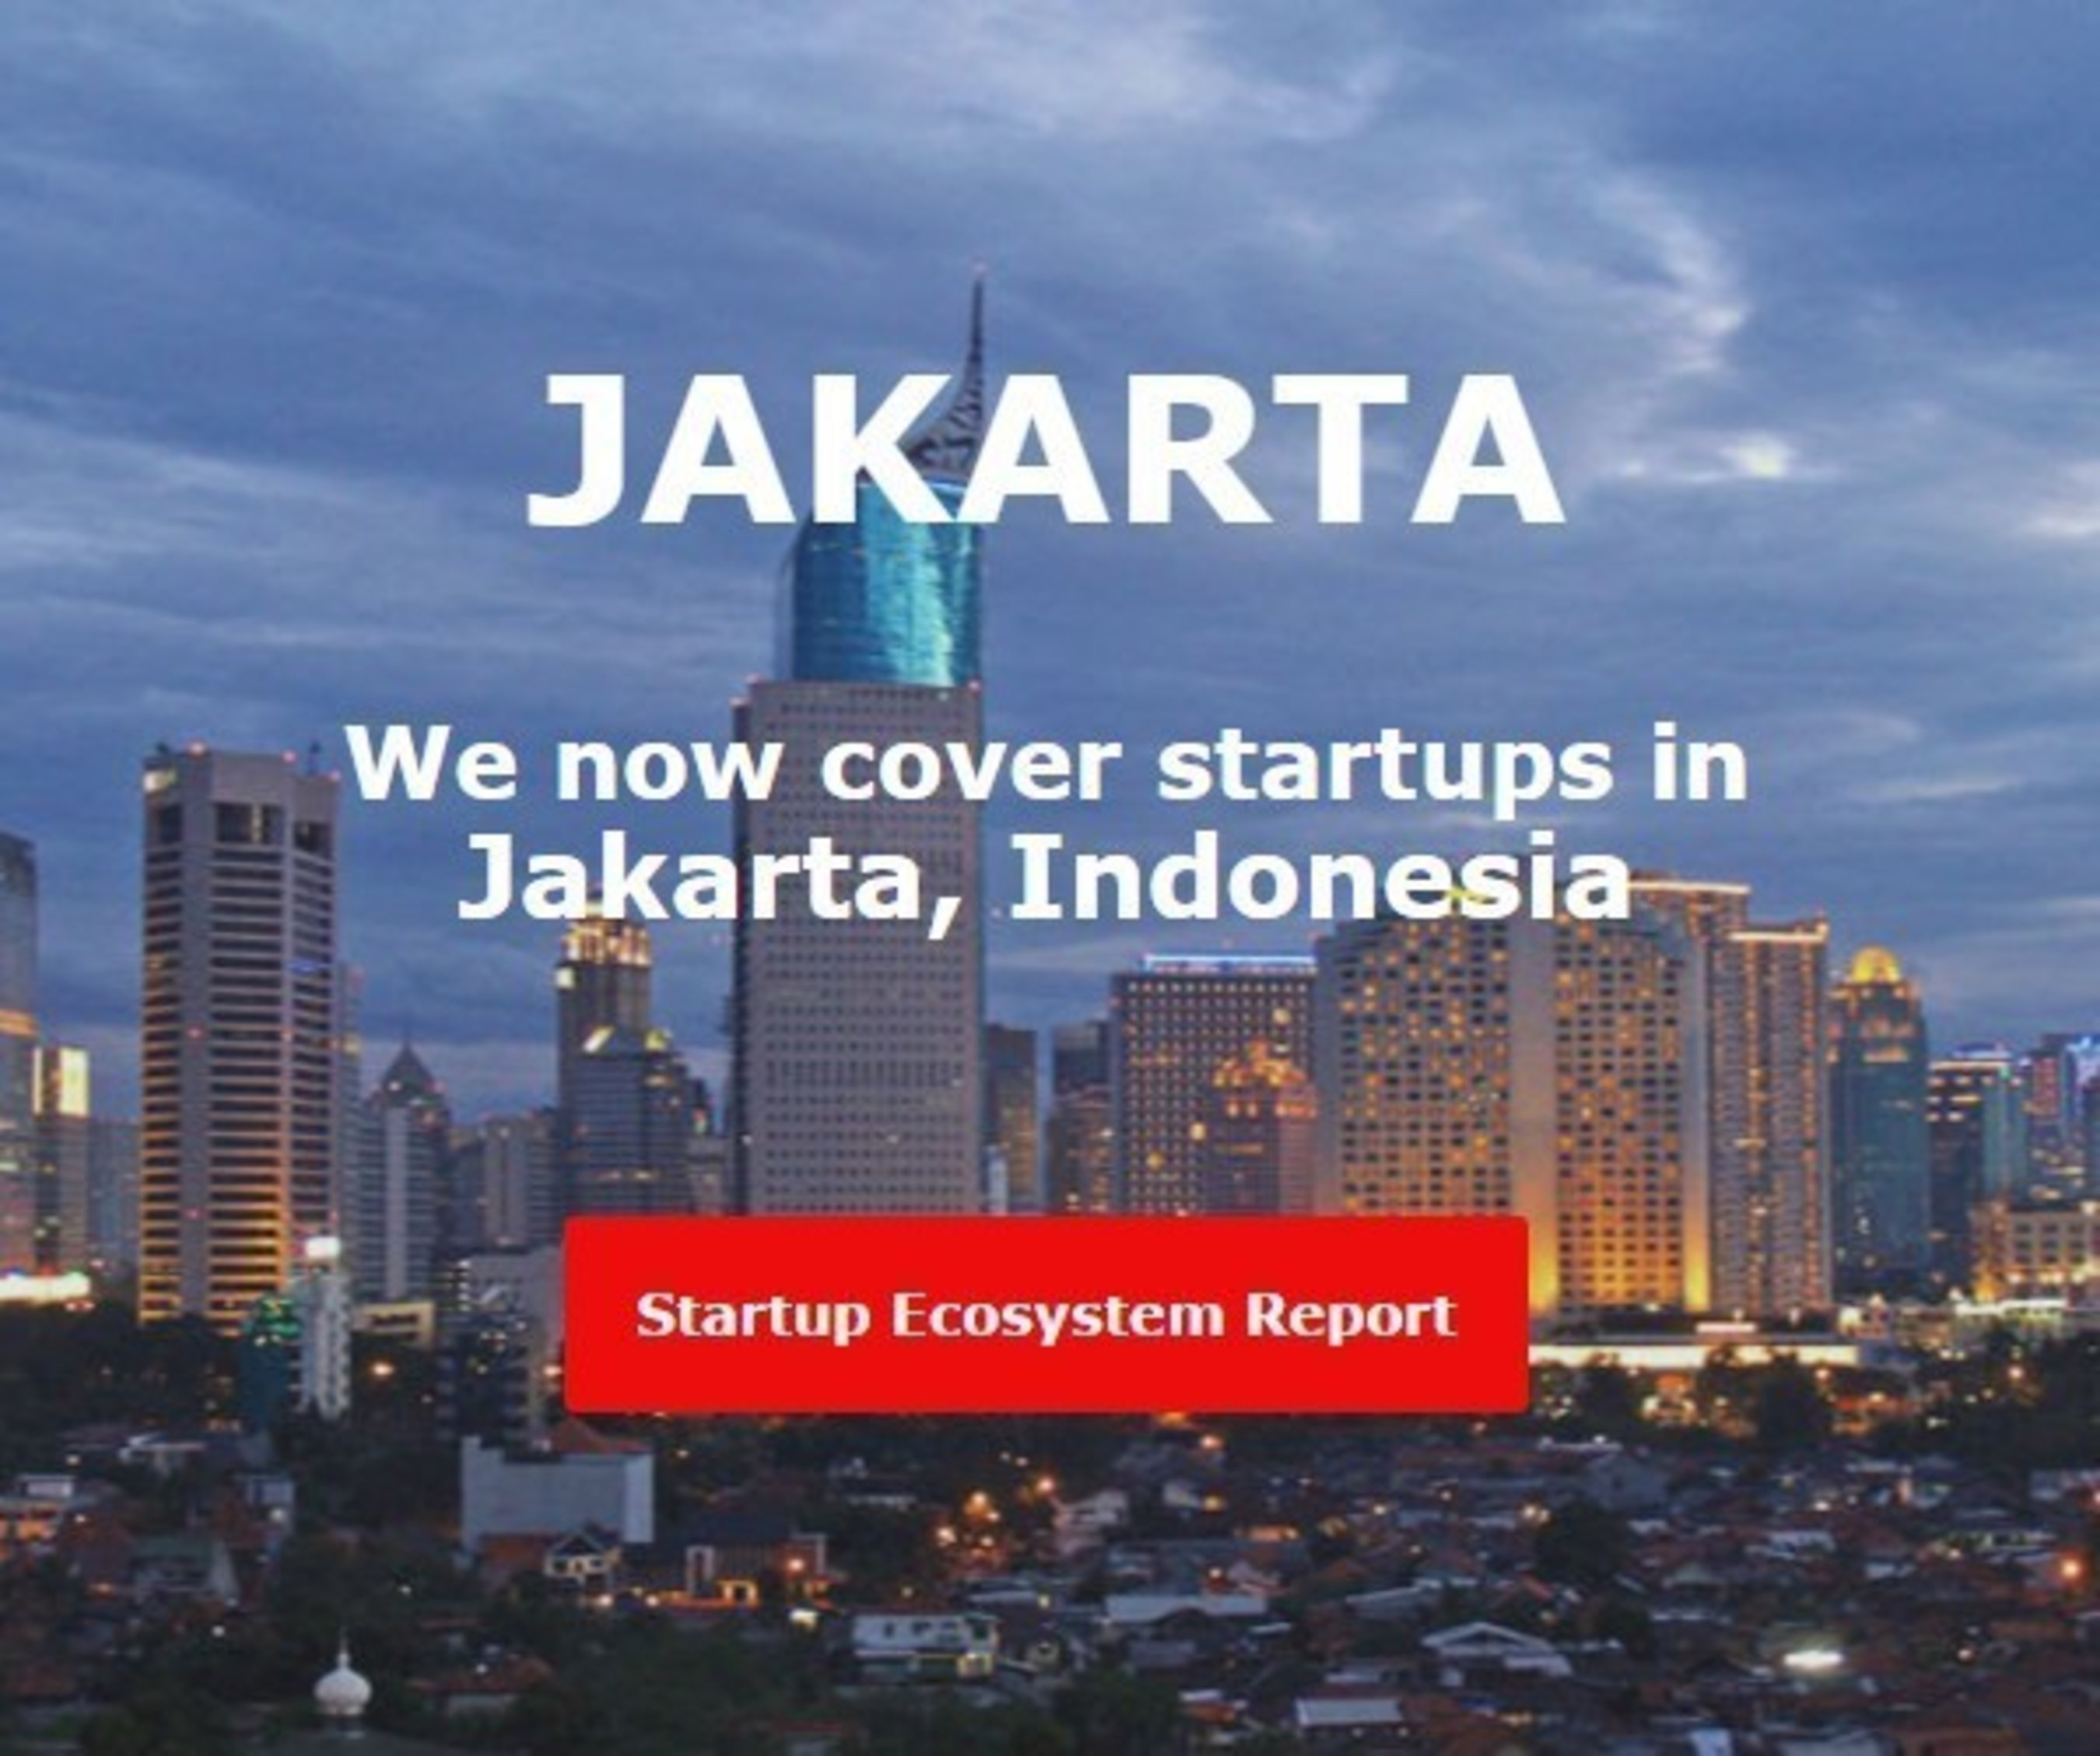 Jakarta Startup Ecosystem